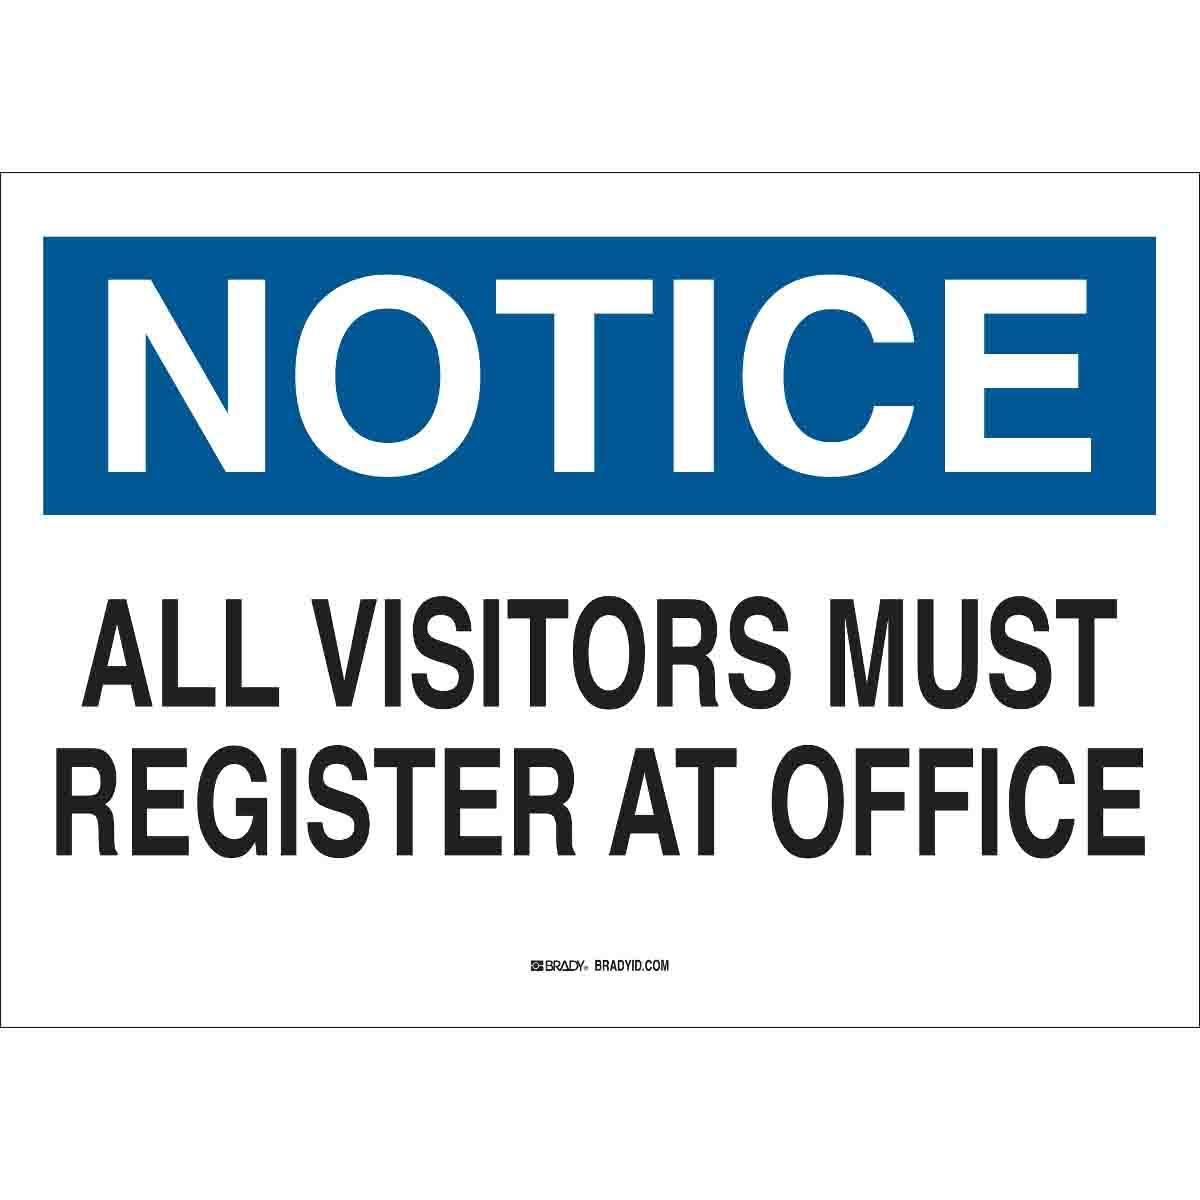 Brady® 95278 Rectangular Admittance Sign, 10 in H x 14 in W, Black/Blue on White, B-120 Fiberglass, Corner Holes Mount